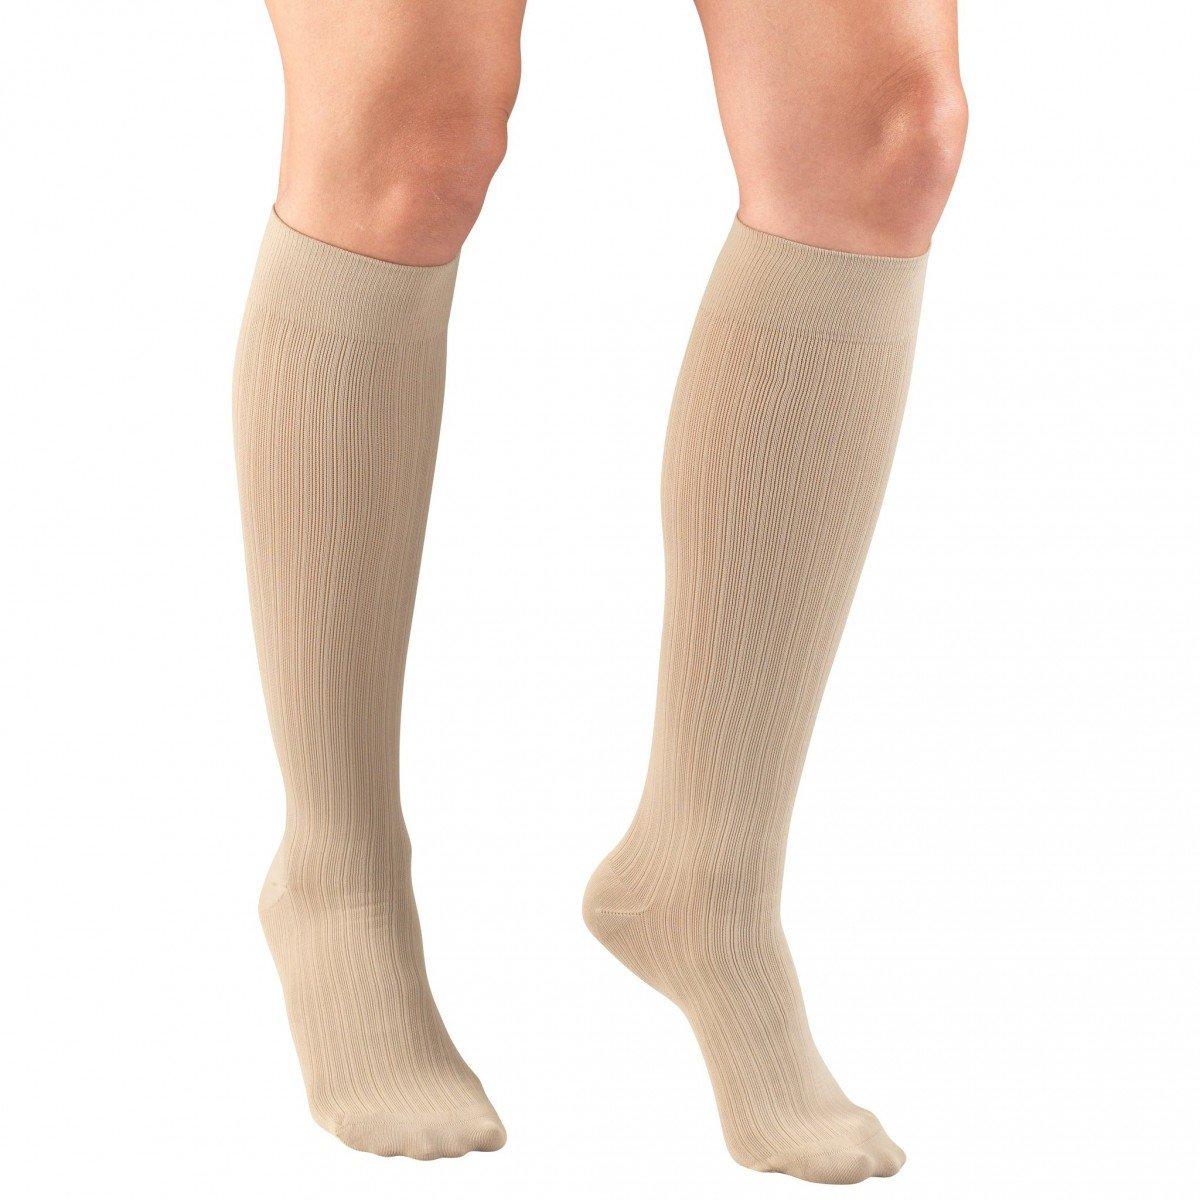 Truform Women's Rib Pattern Trouser Socks 15-20 mmHg Knee High Tan